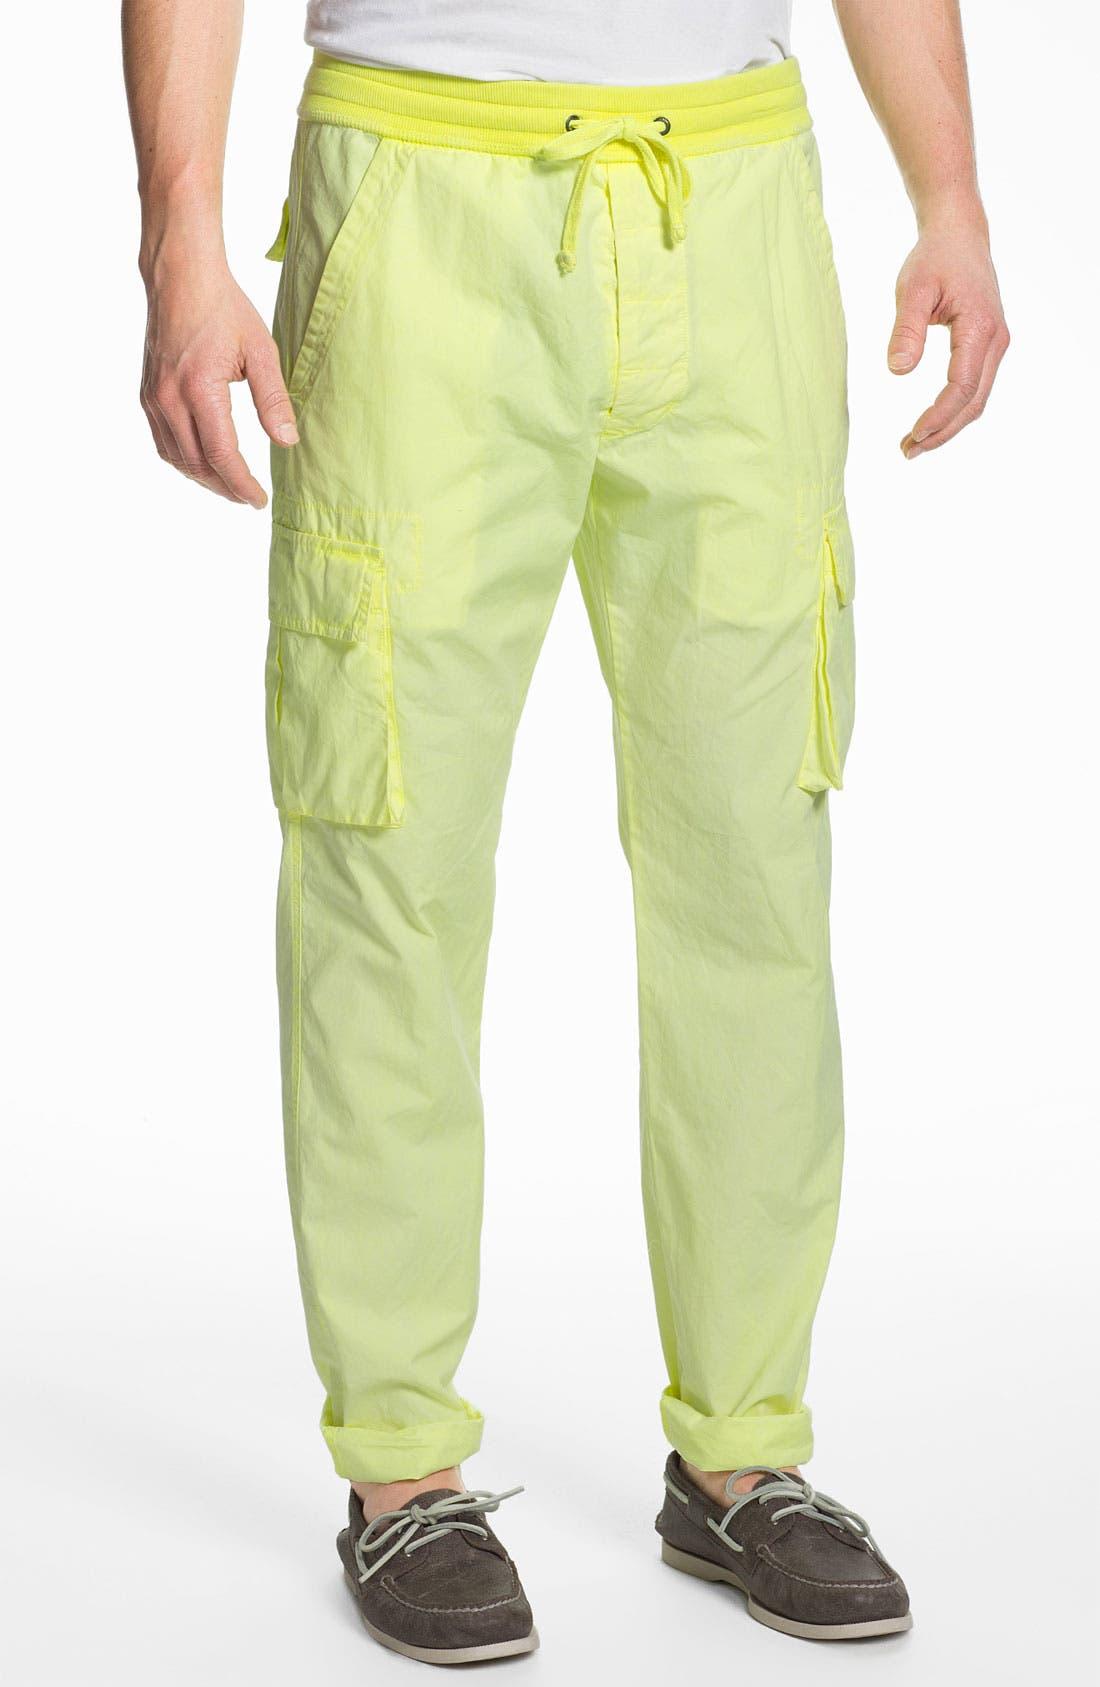 Alternate Image 1 Selected - Splendid Mills 'Corpus' Slim Straight Leg Cargo Pants